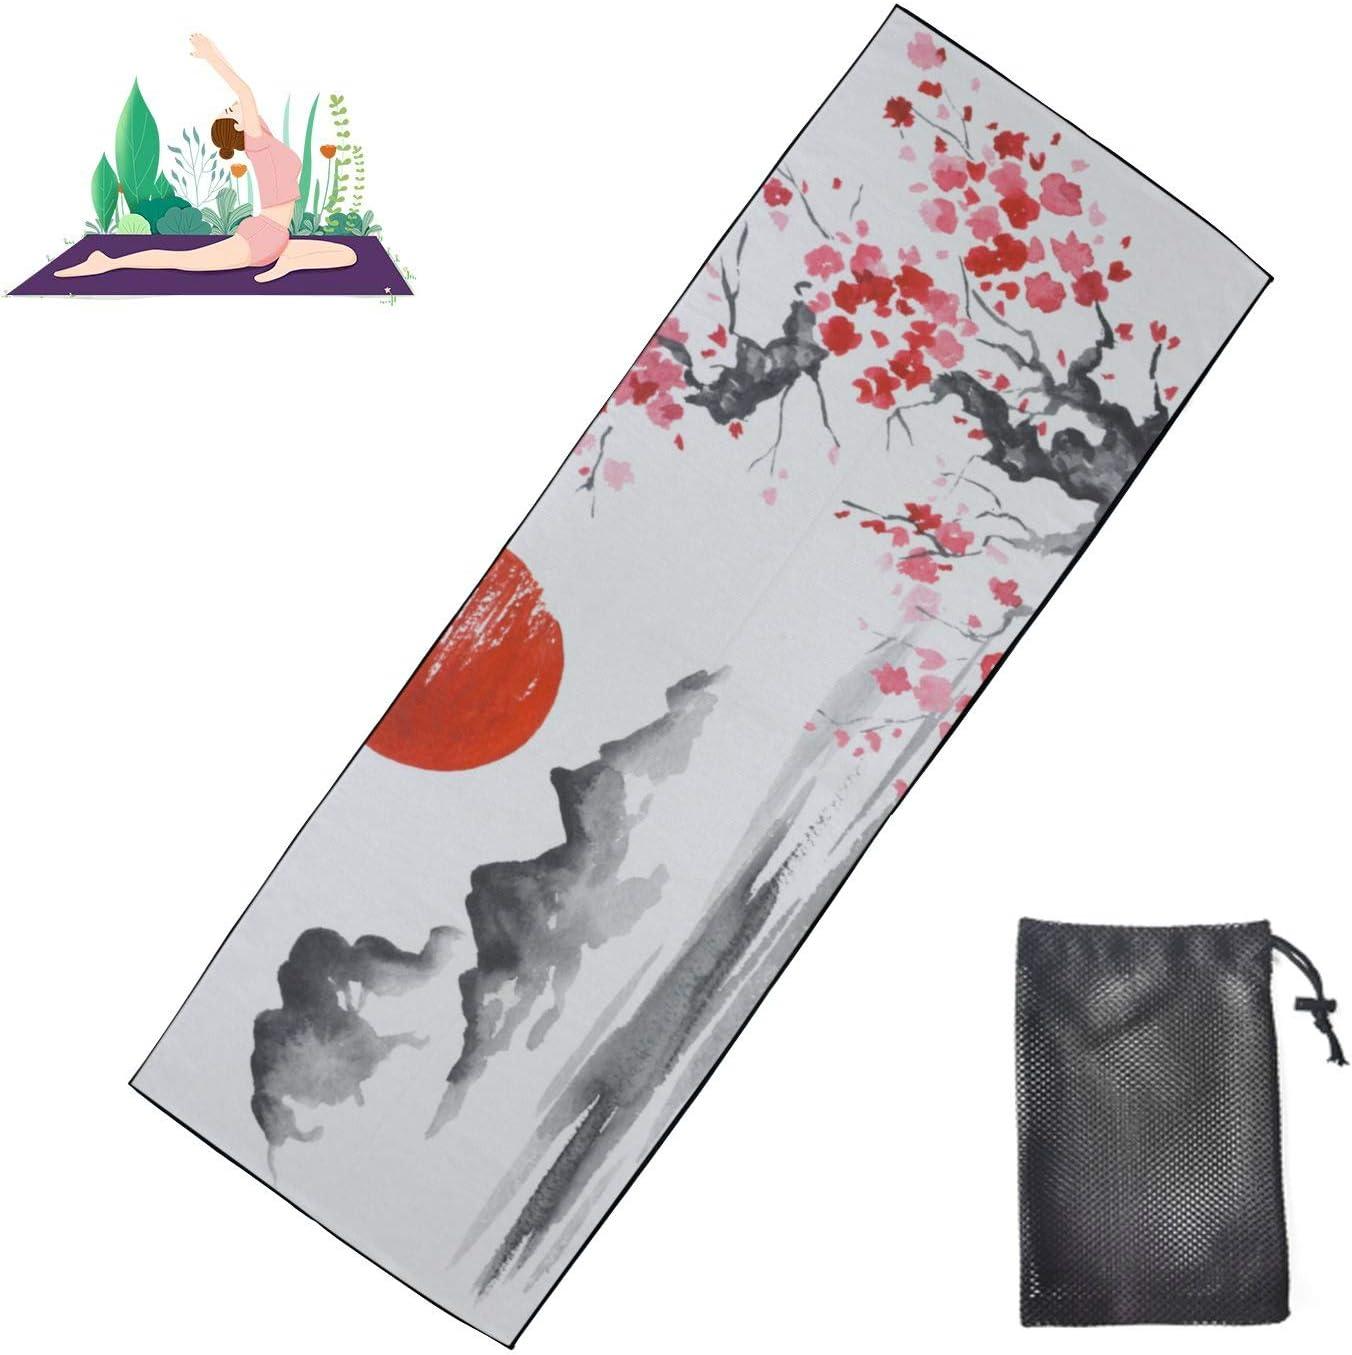 Jnseff Max 84% OFF Sale item Yoga Towel Japan Traditional Unisex M Painting Sumie